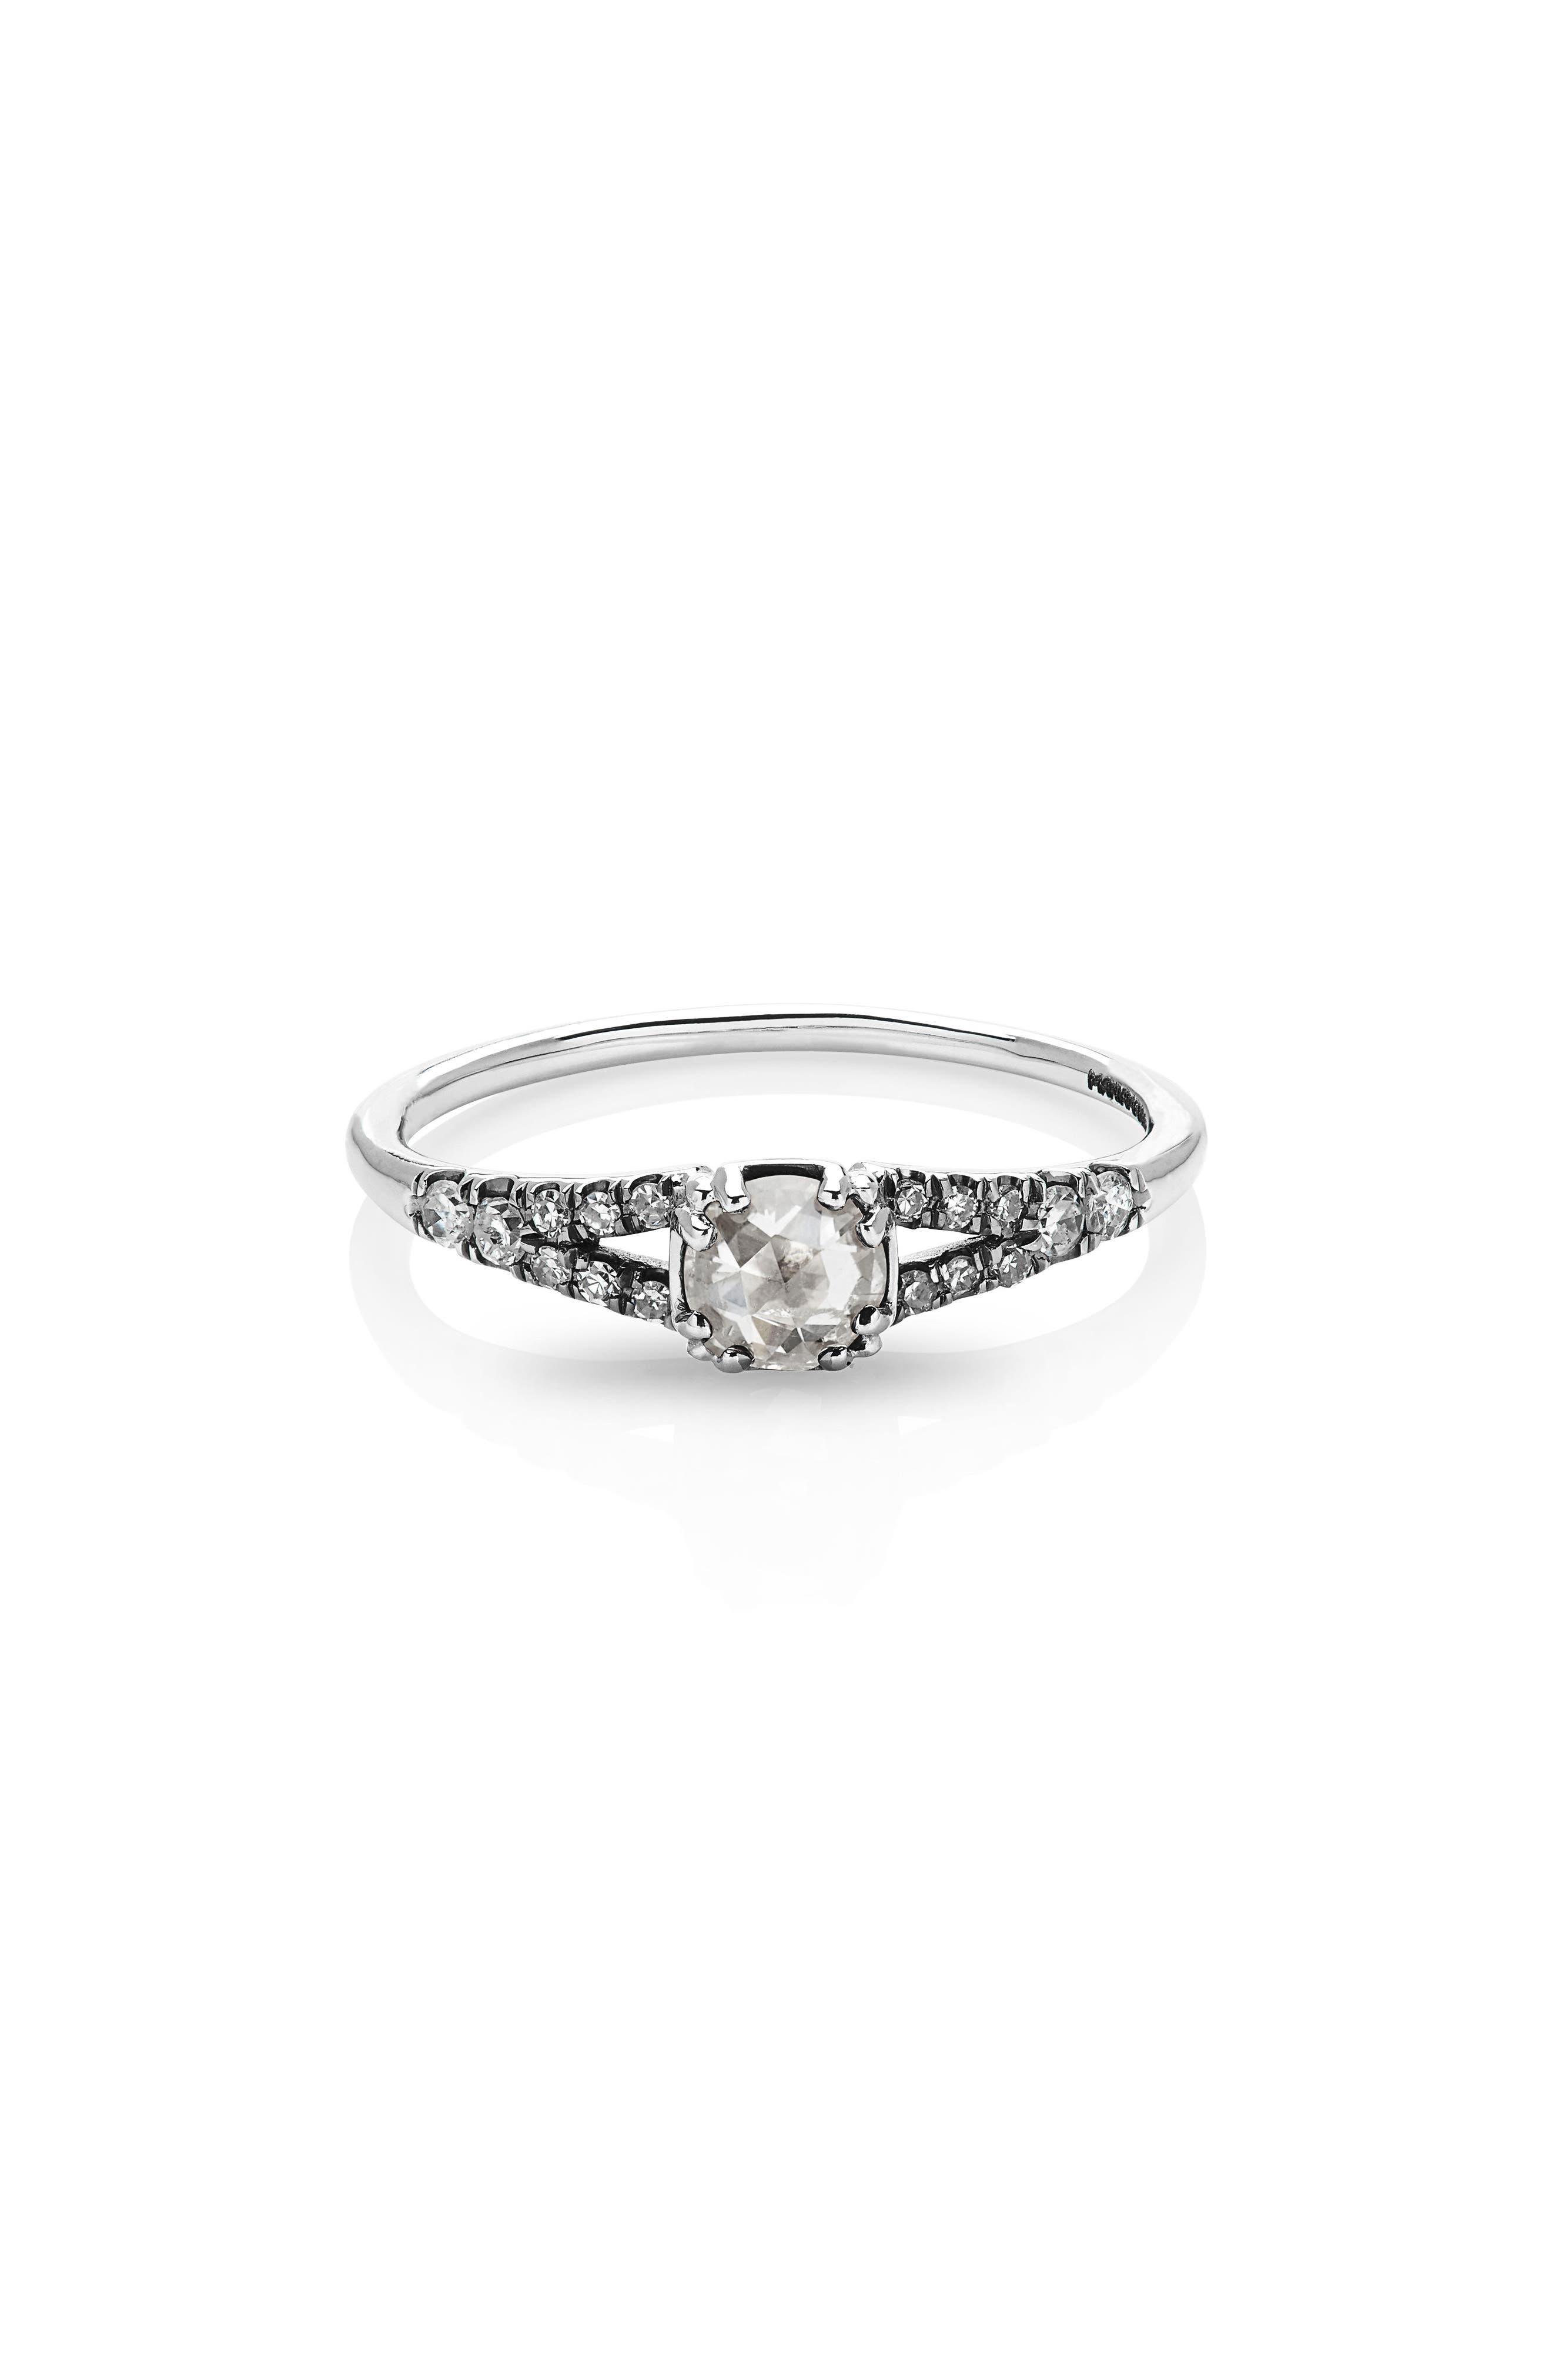 Devotion Solitaire Diamond Ring,                             Main thumbnail 1, color,                             White Gold